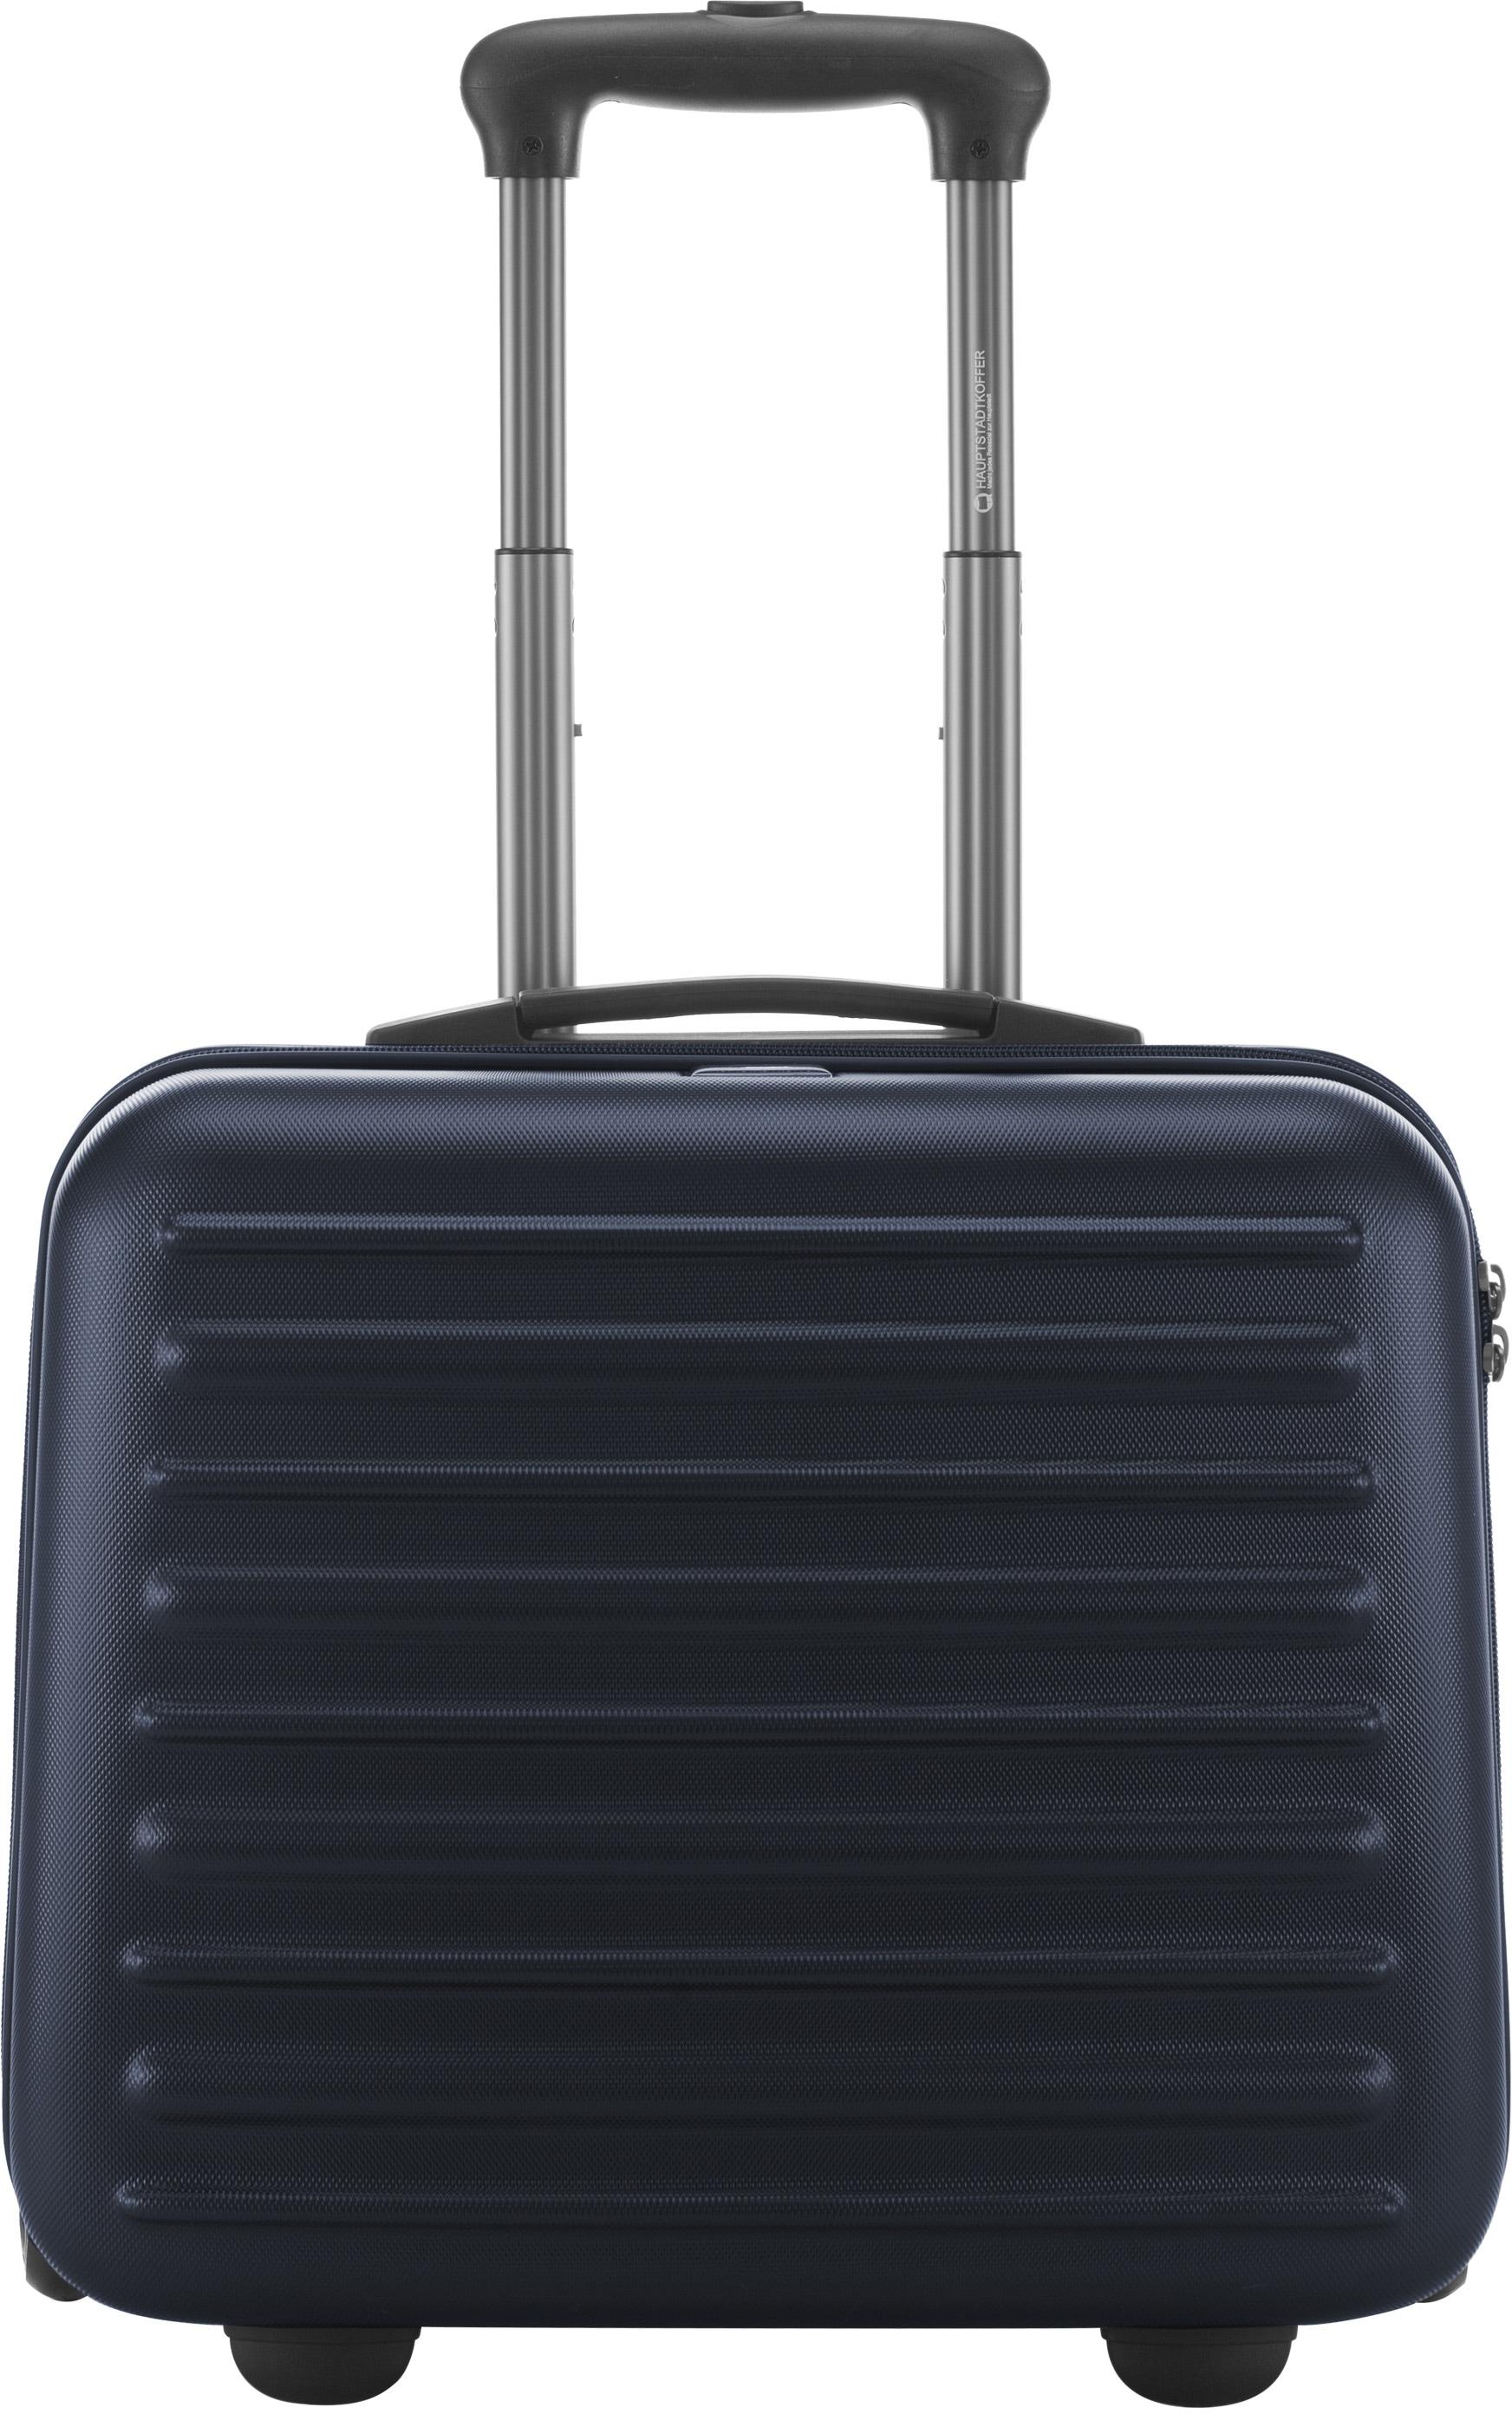 HAUPTSTADTKOFFER Pilotenkoffer mit 2 Rollen, »Tegel mit TSA Schloss« | Taschen > Koffer & Trolleys > Pilotenkoffer | hauptstadtkoffer